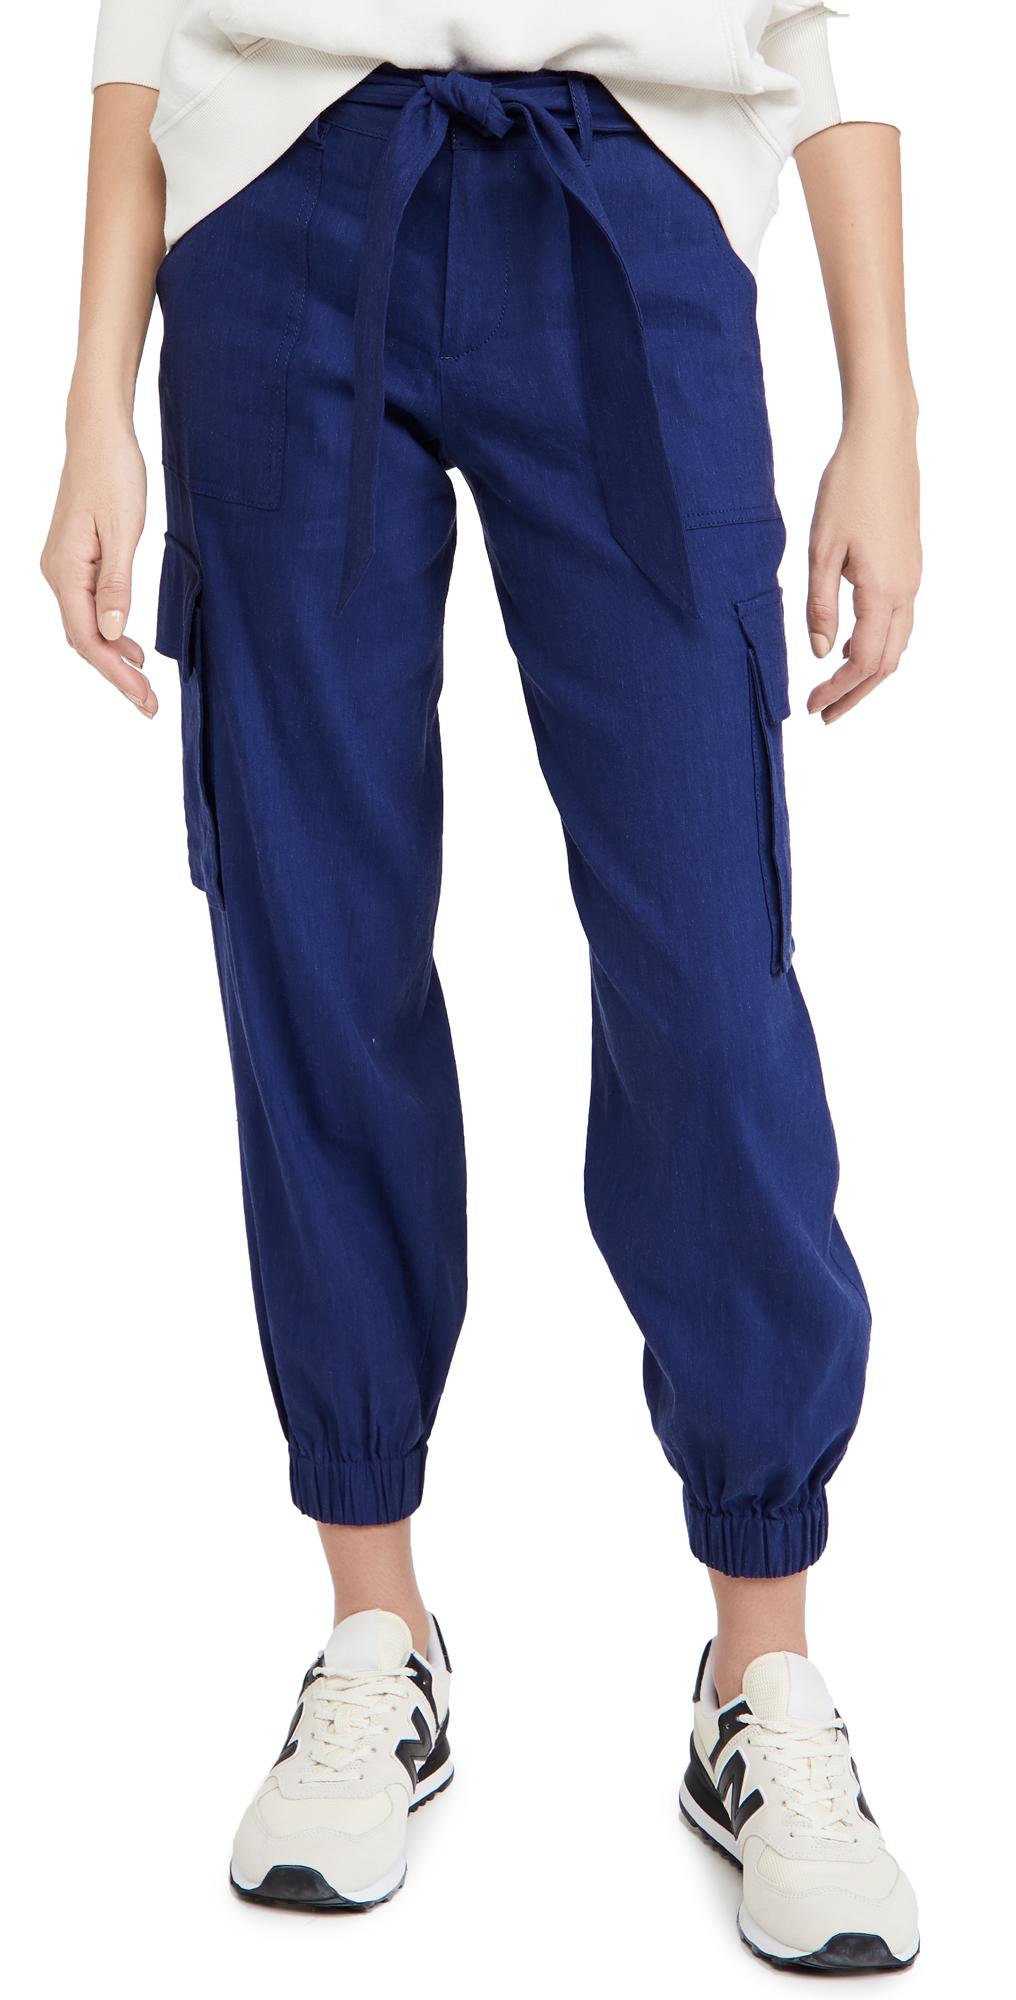 alice + olivia Verla Belted Slim Cargo Pants